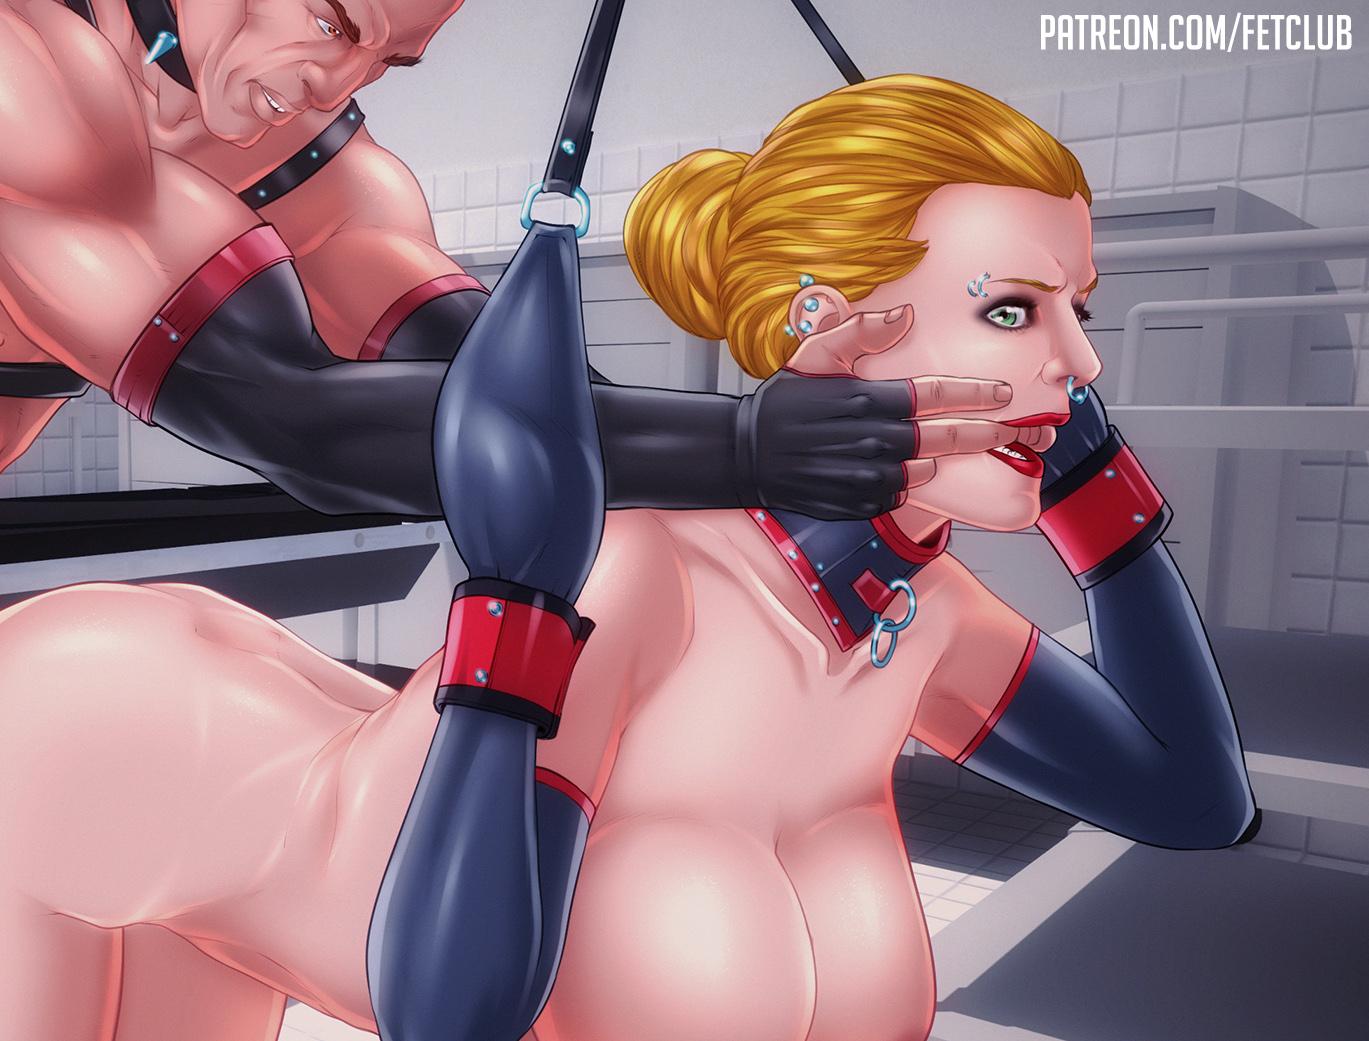 Blond Slave